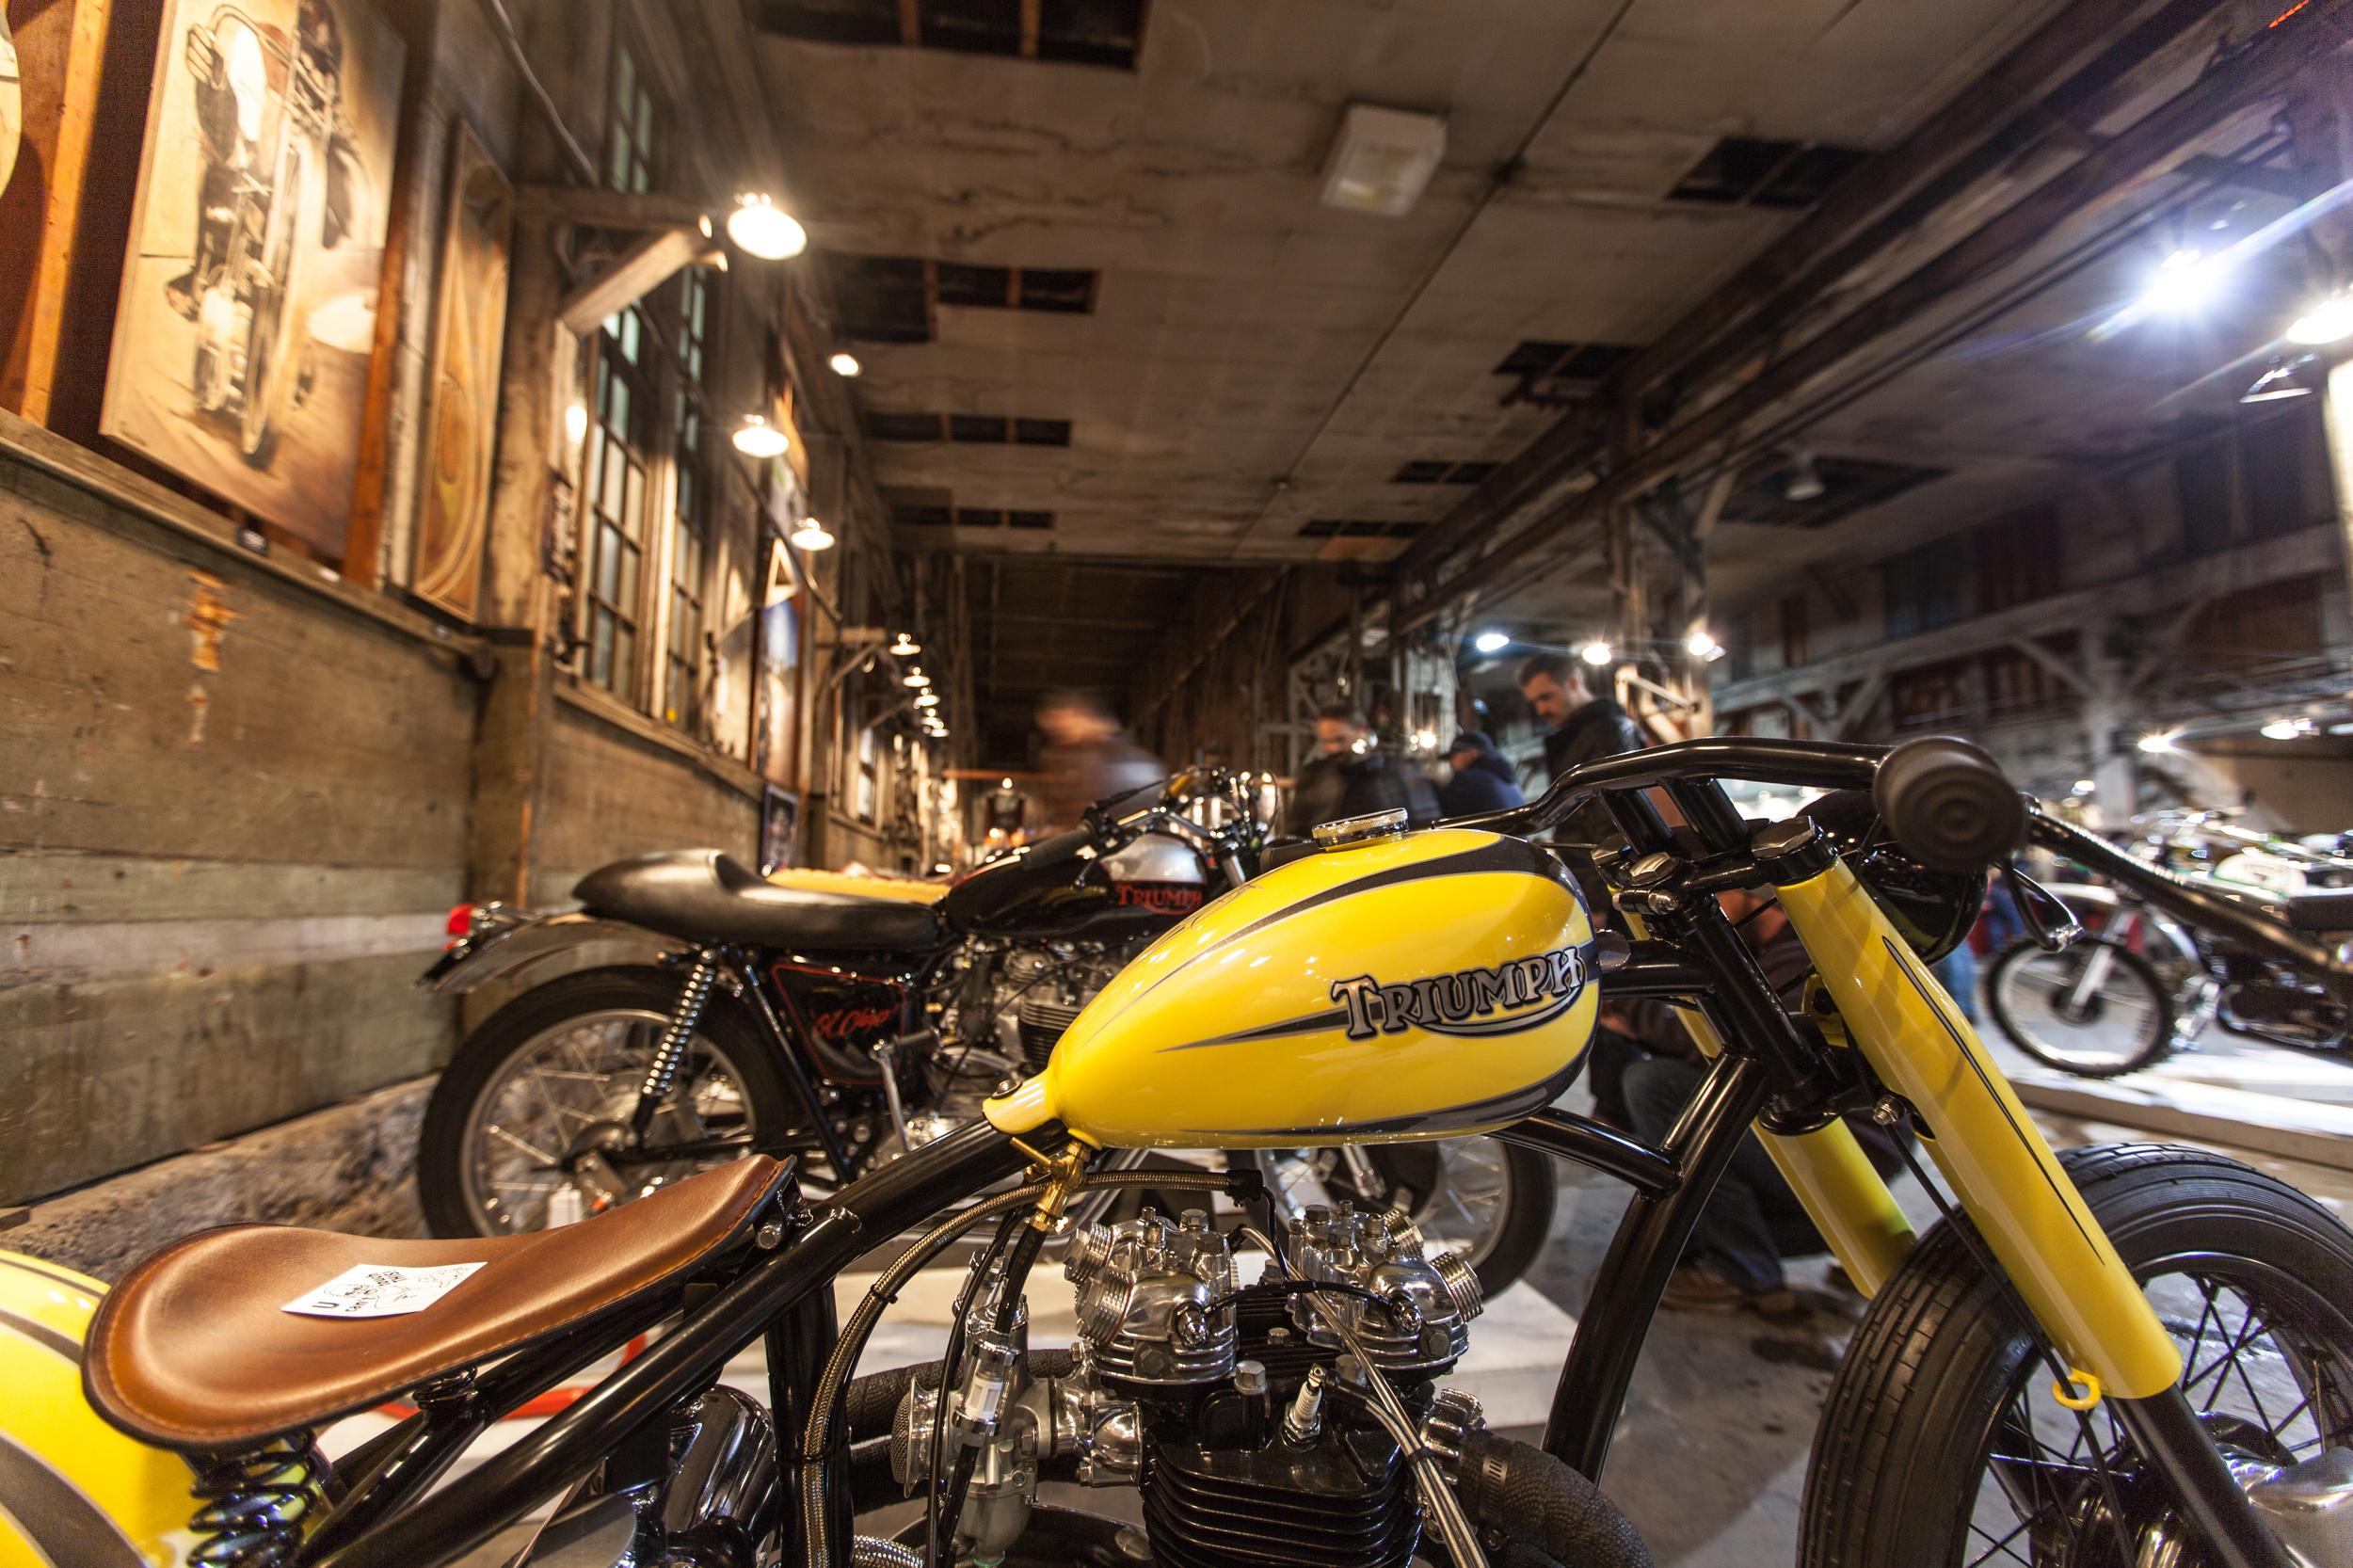 02-14-15 The 1 Moto Show - 2_-17-19.jpg